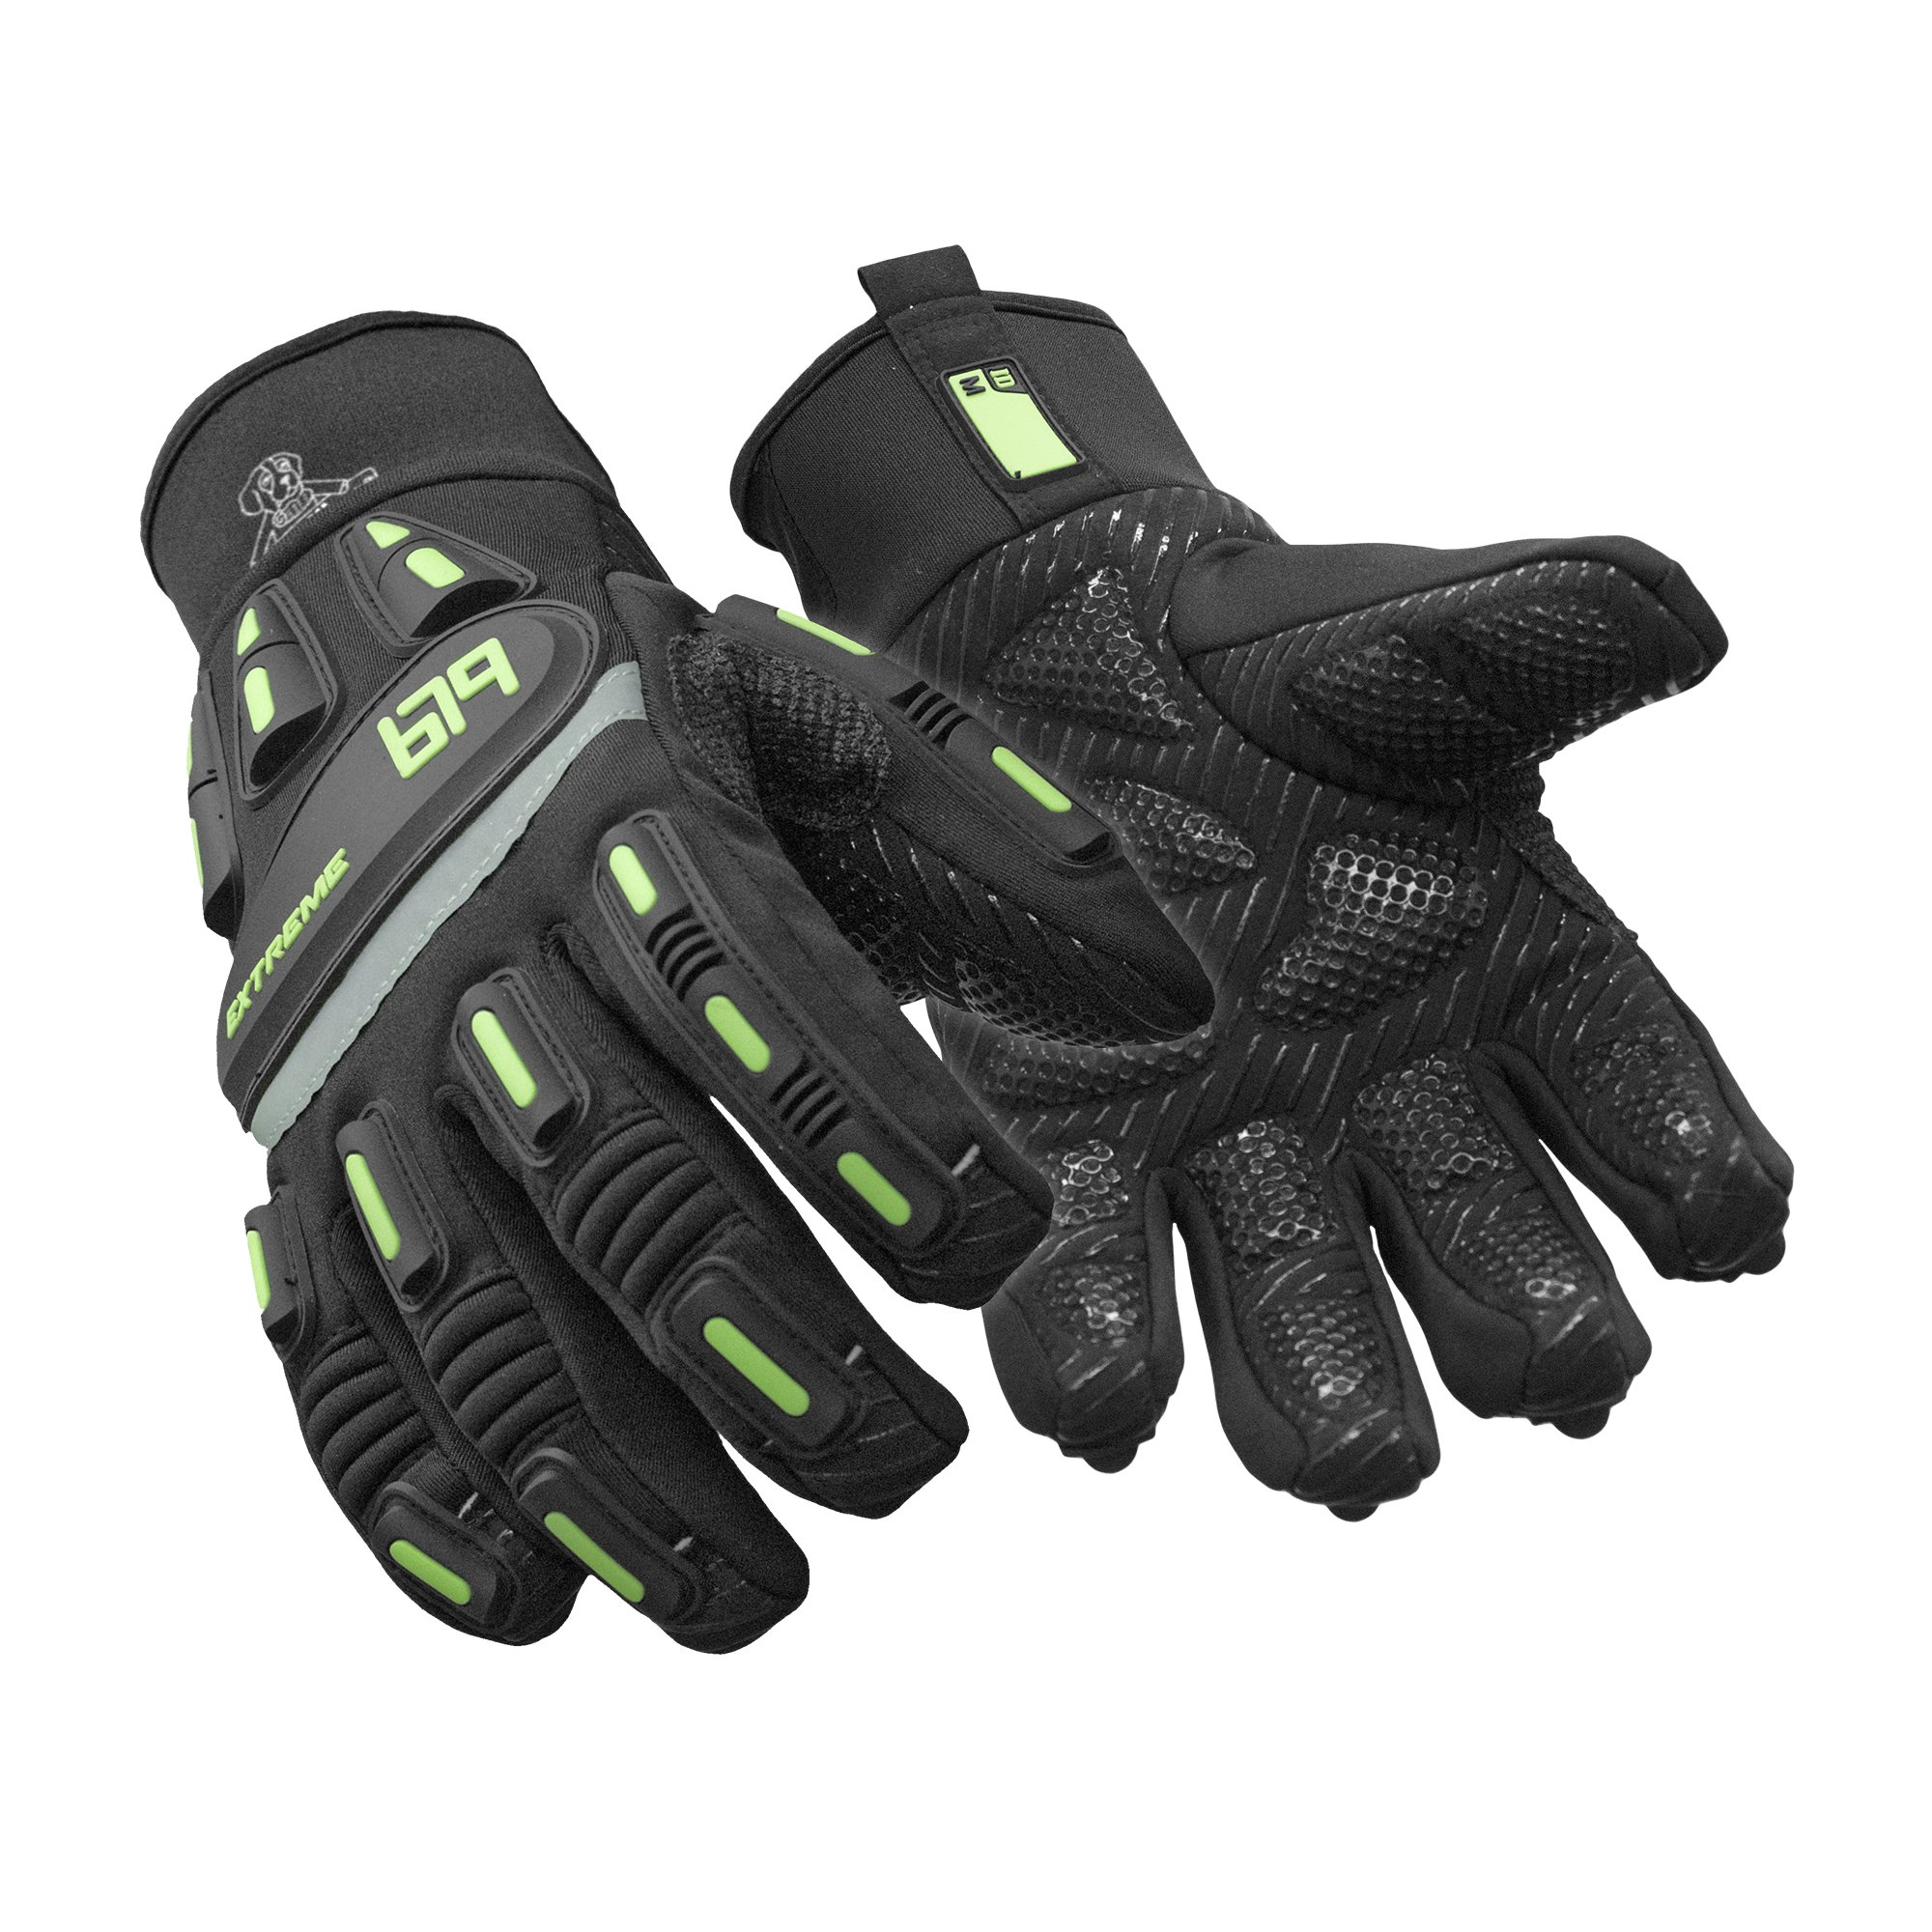 Refrigiwear Men's Insulated Extreme Freezer Gloves, Black Large